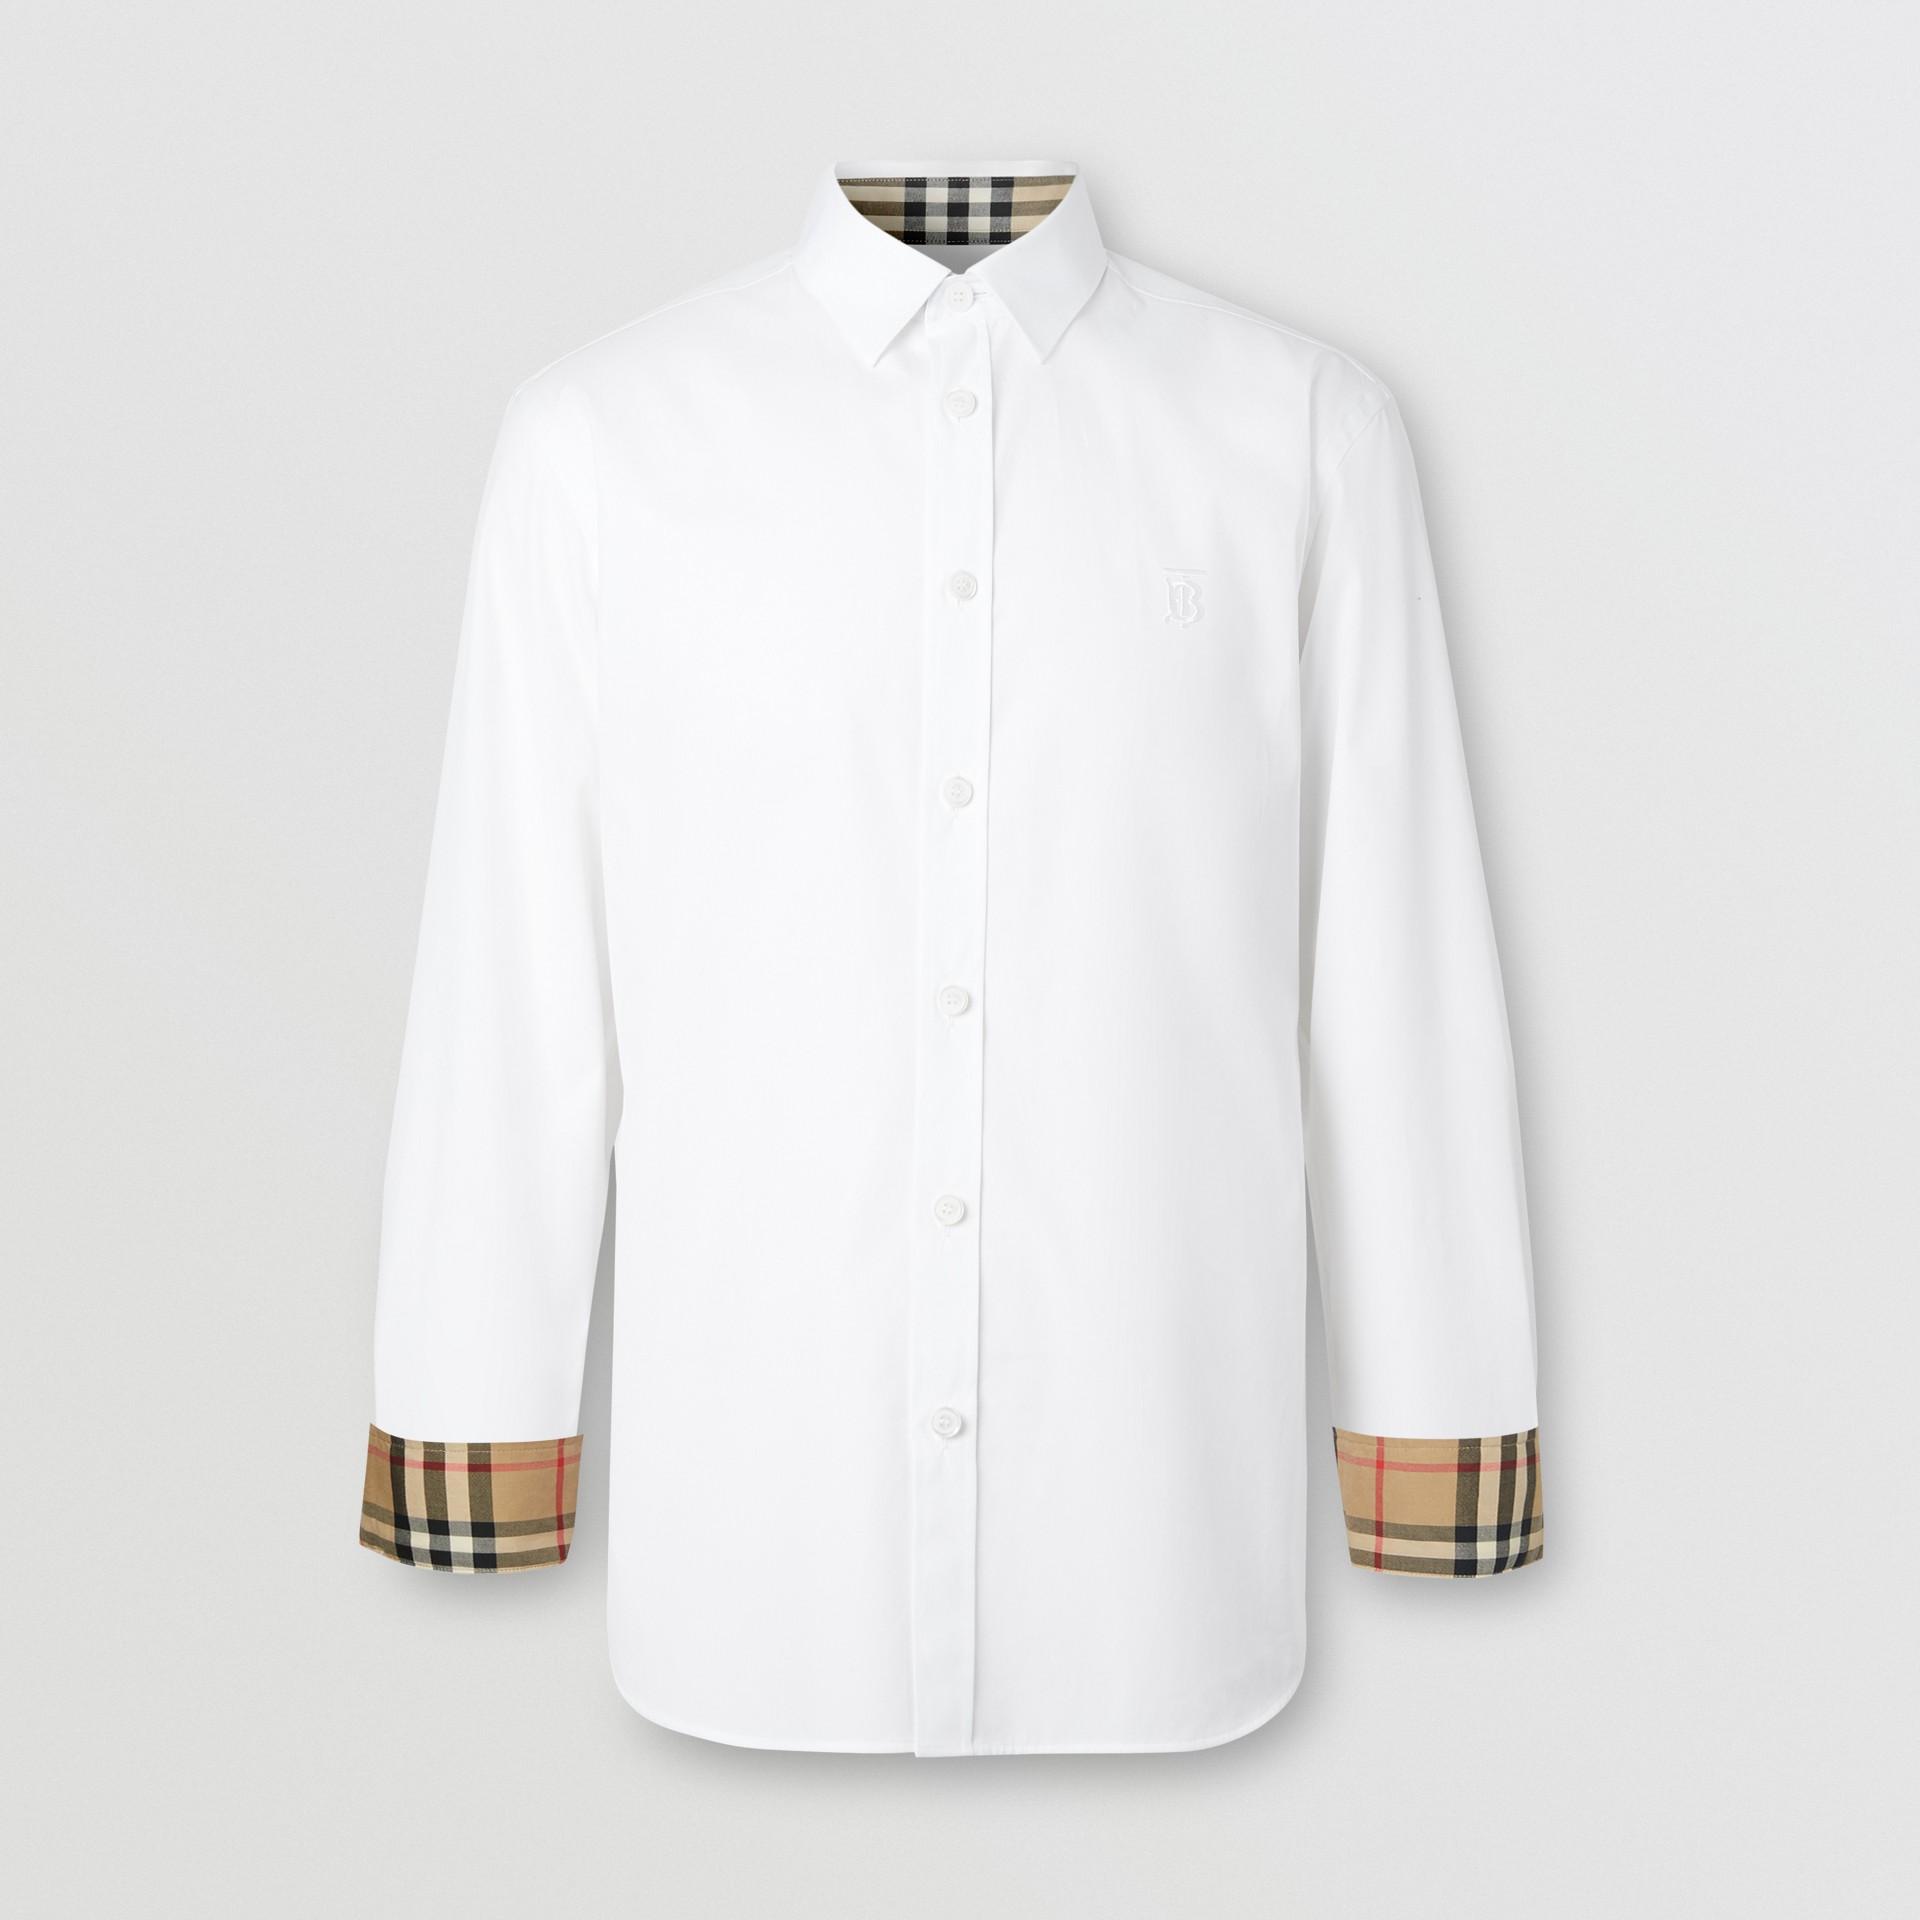 Slim Fit Monogram Motif Stretch Cotton Poplin Shirt in White - Men | Burberry United States - gallery image 3